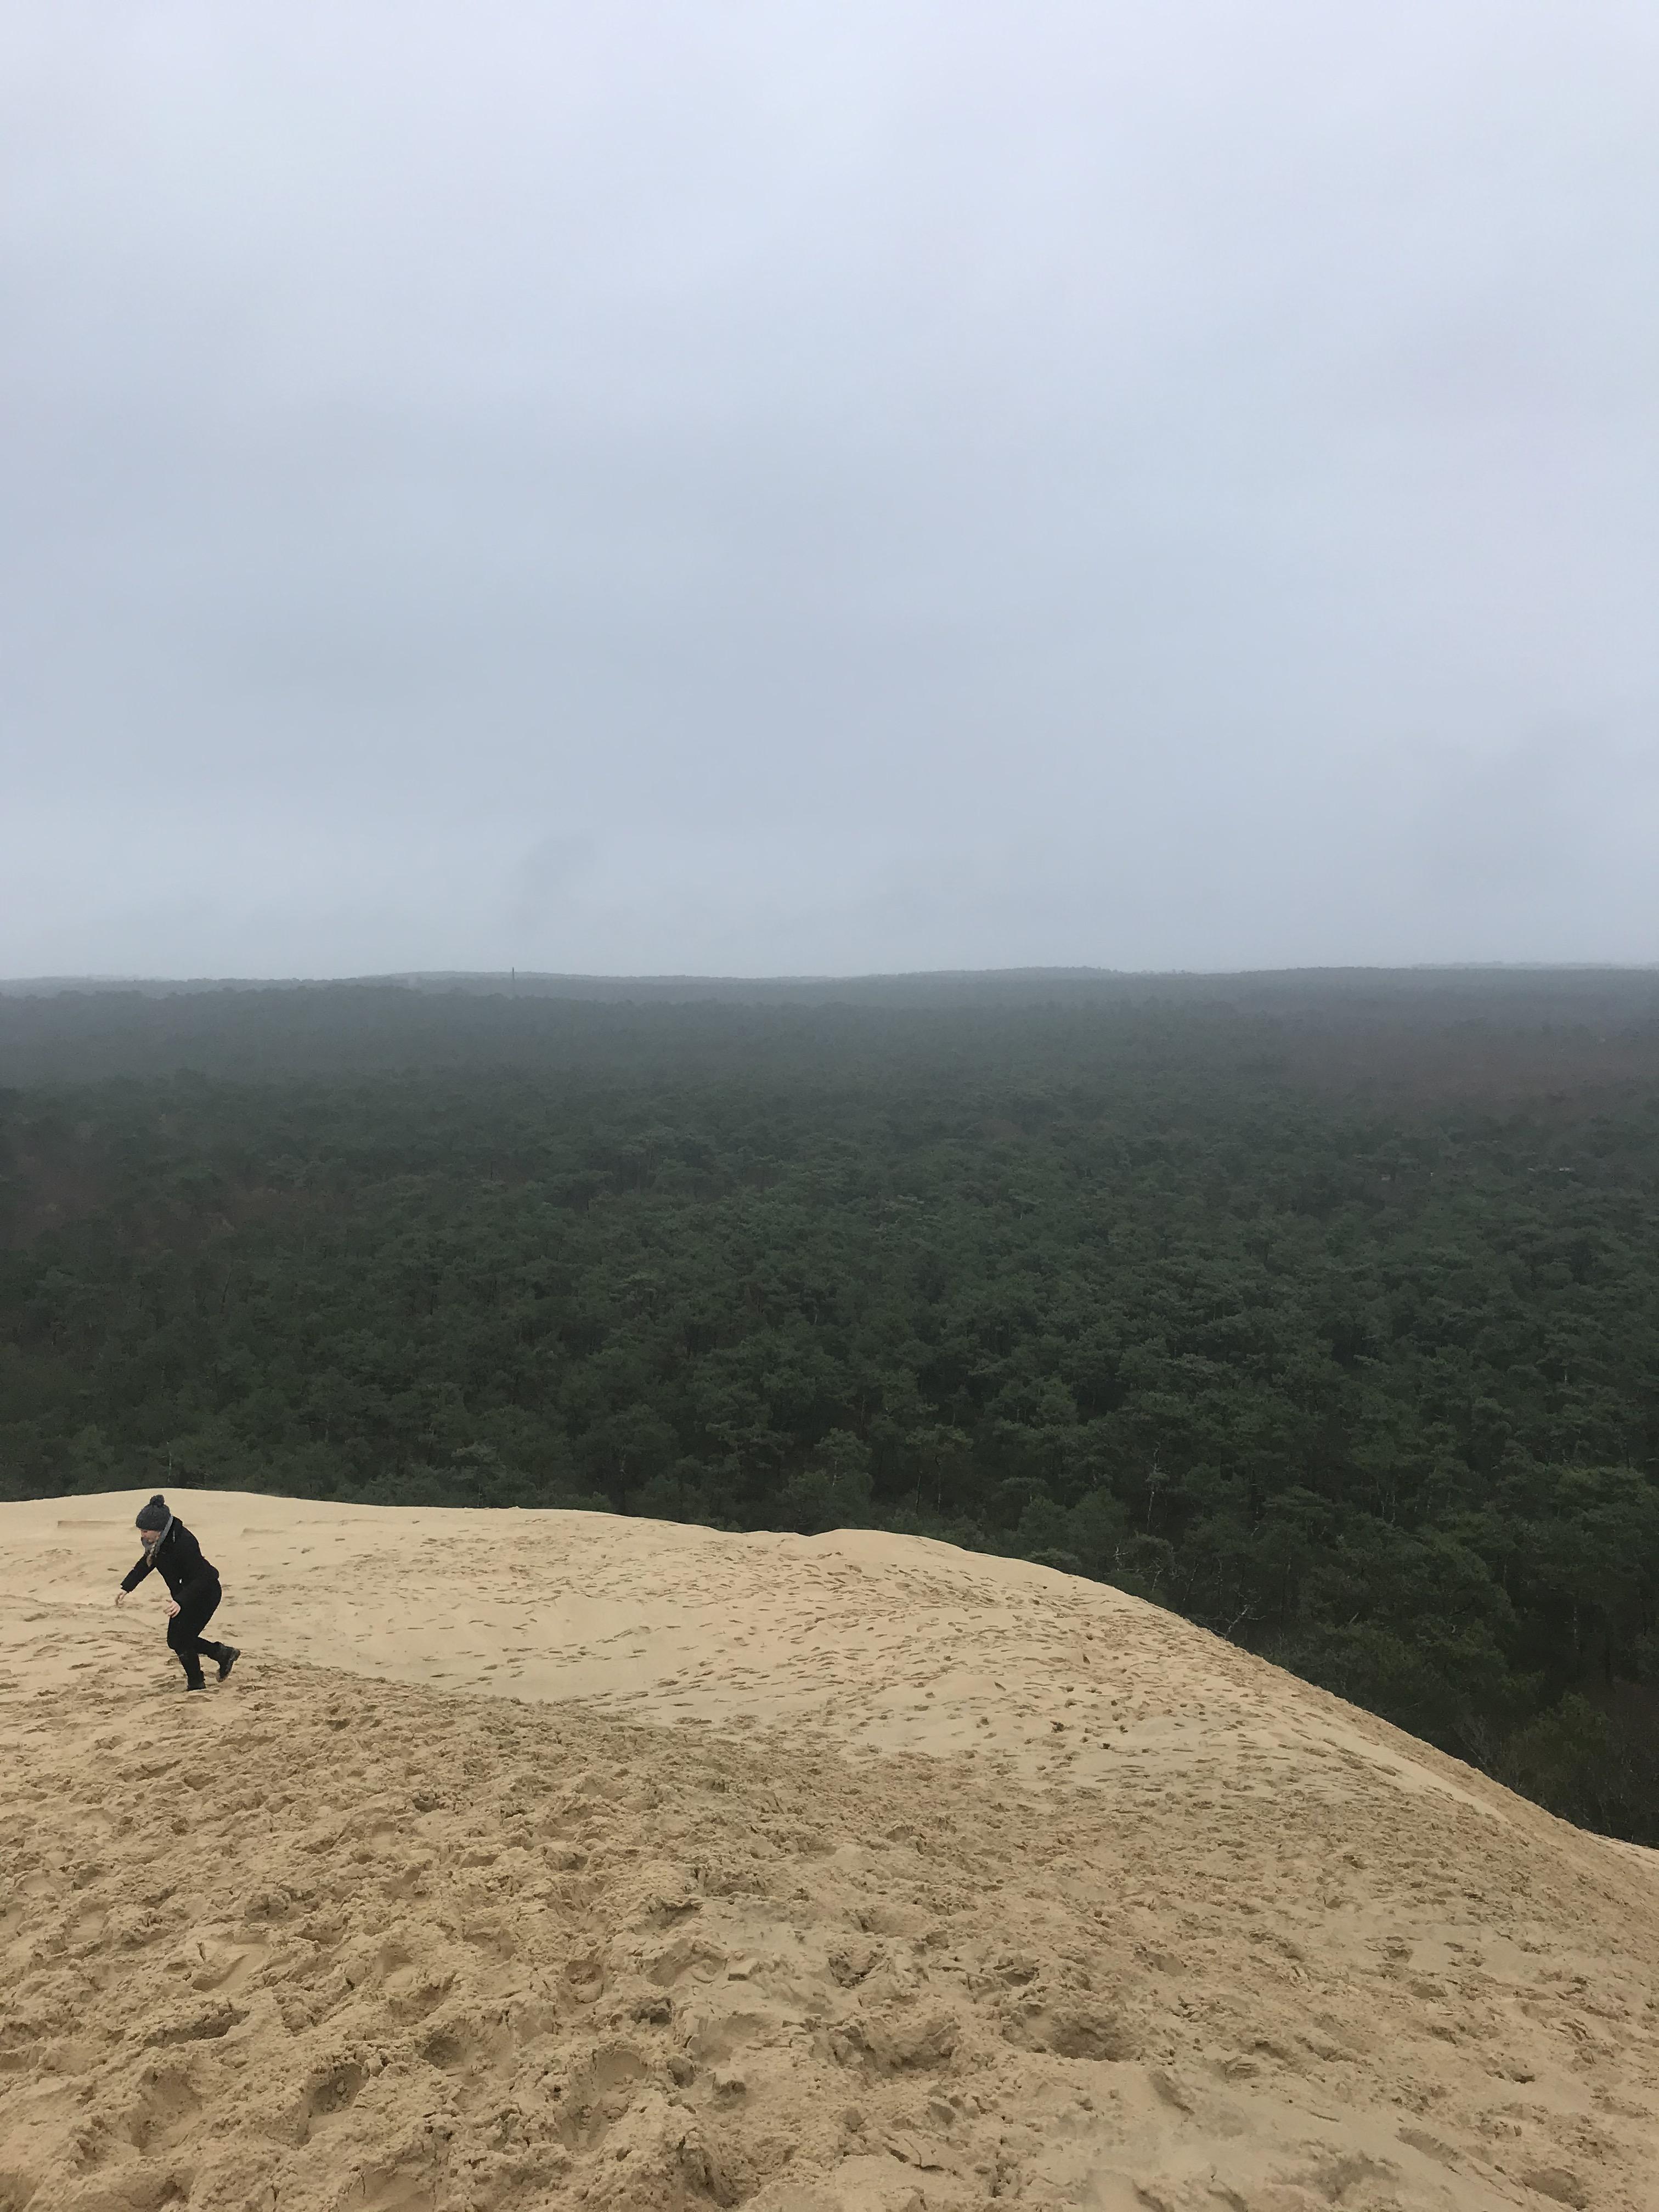 duna-di-pilat-paesaggio-circostante